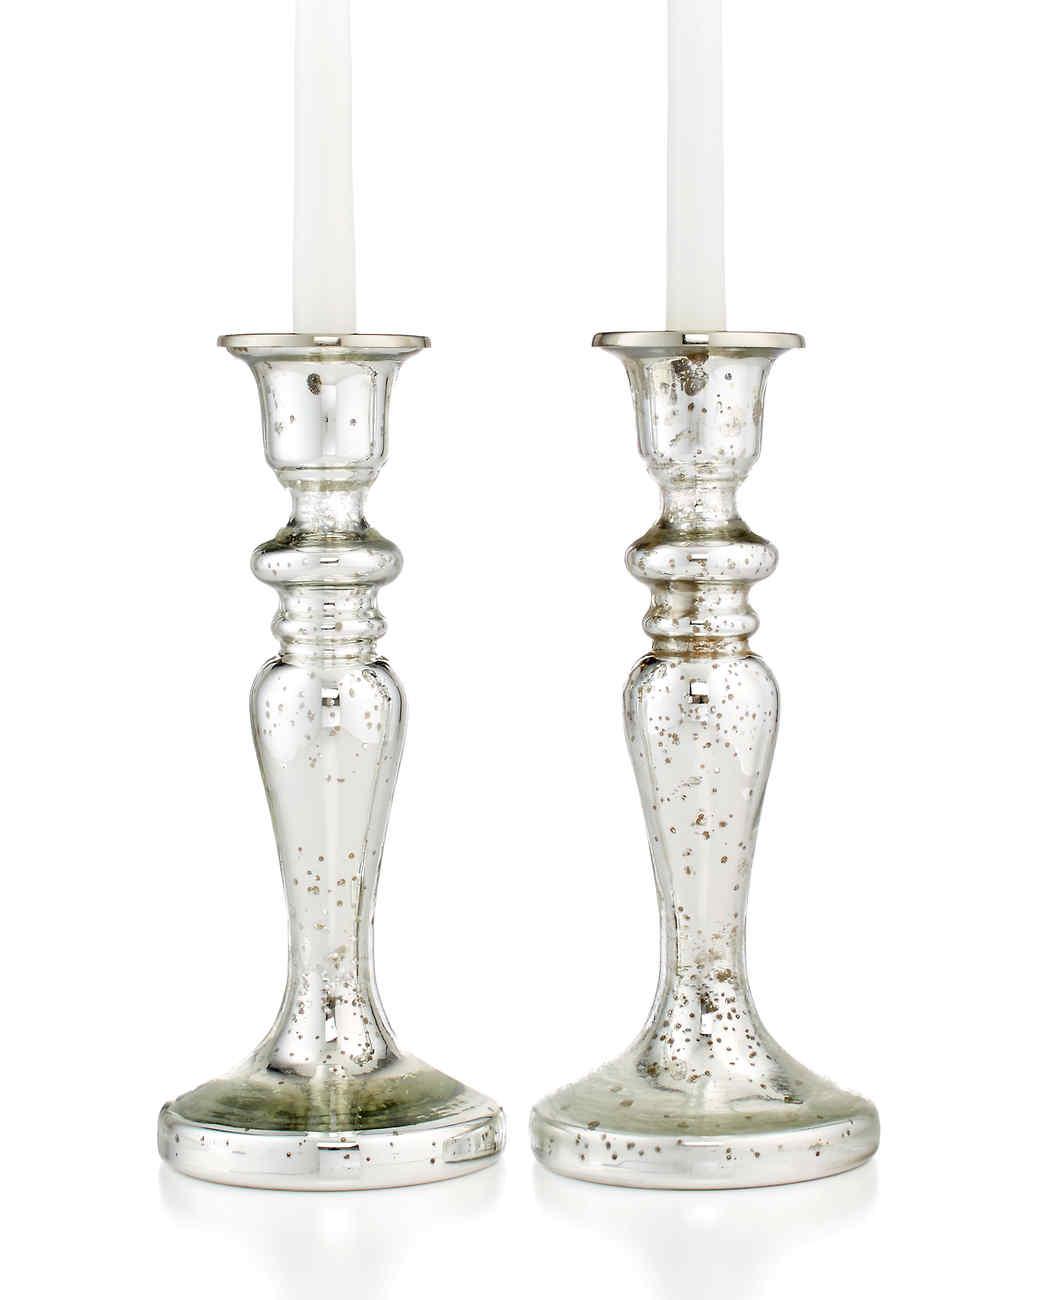 msmacys-candle-holders-mercury-glass-tapers-large-mrkt-1013.jpg